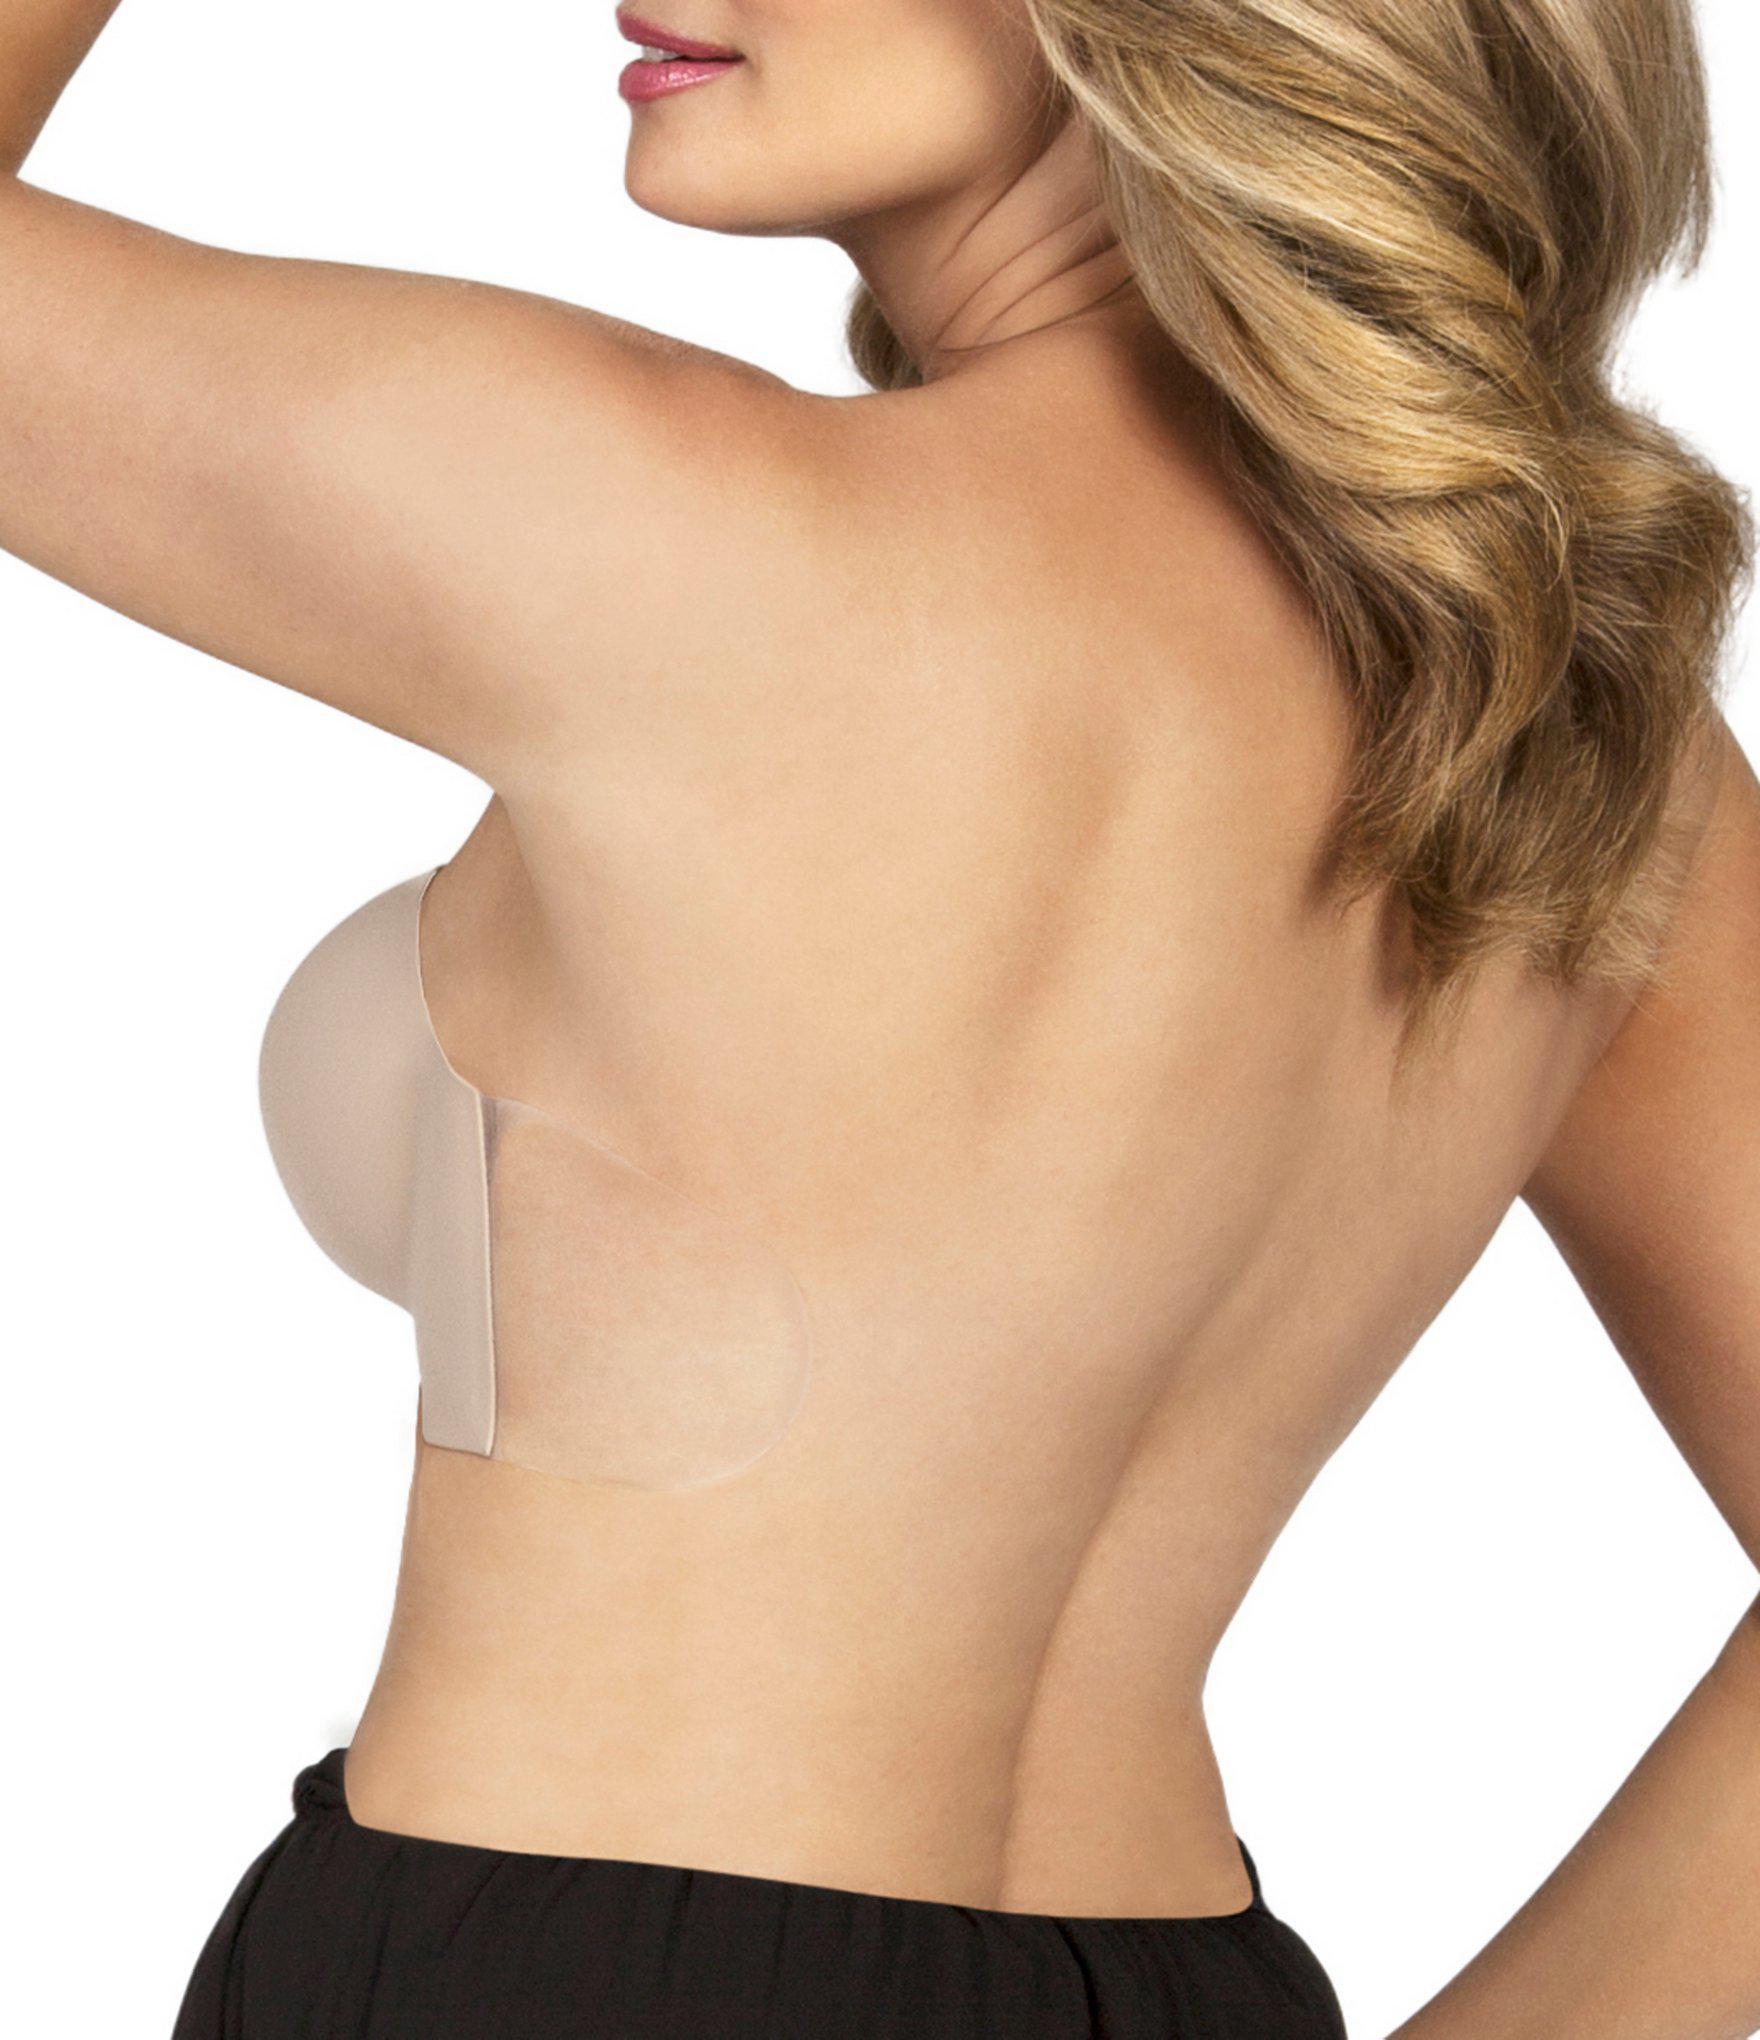 b34b64b7cc3f1 Fashion Forms - Natural Voluptuous Backless Strapless Bra - Lyst. View  fullscreen